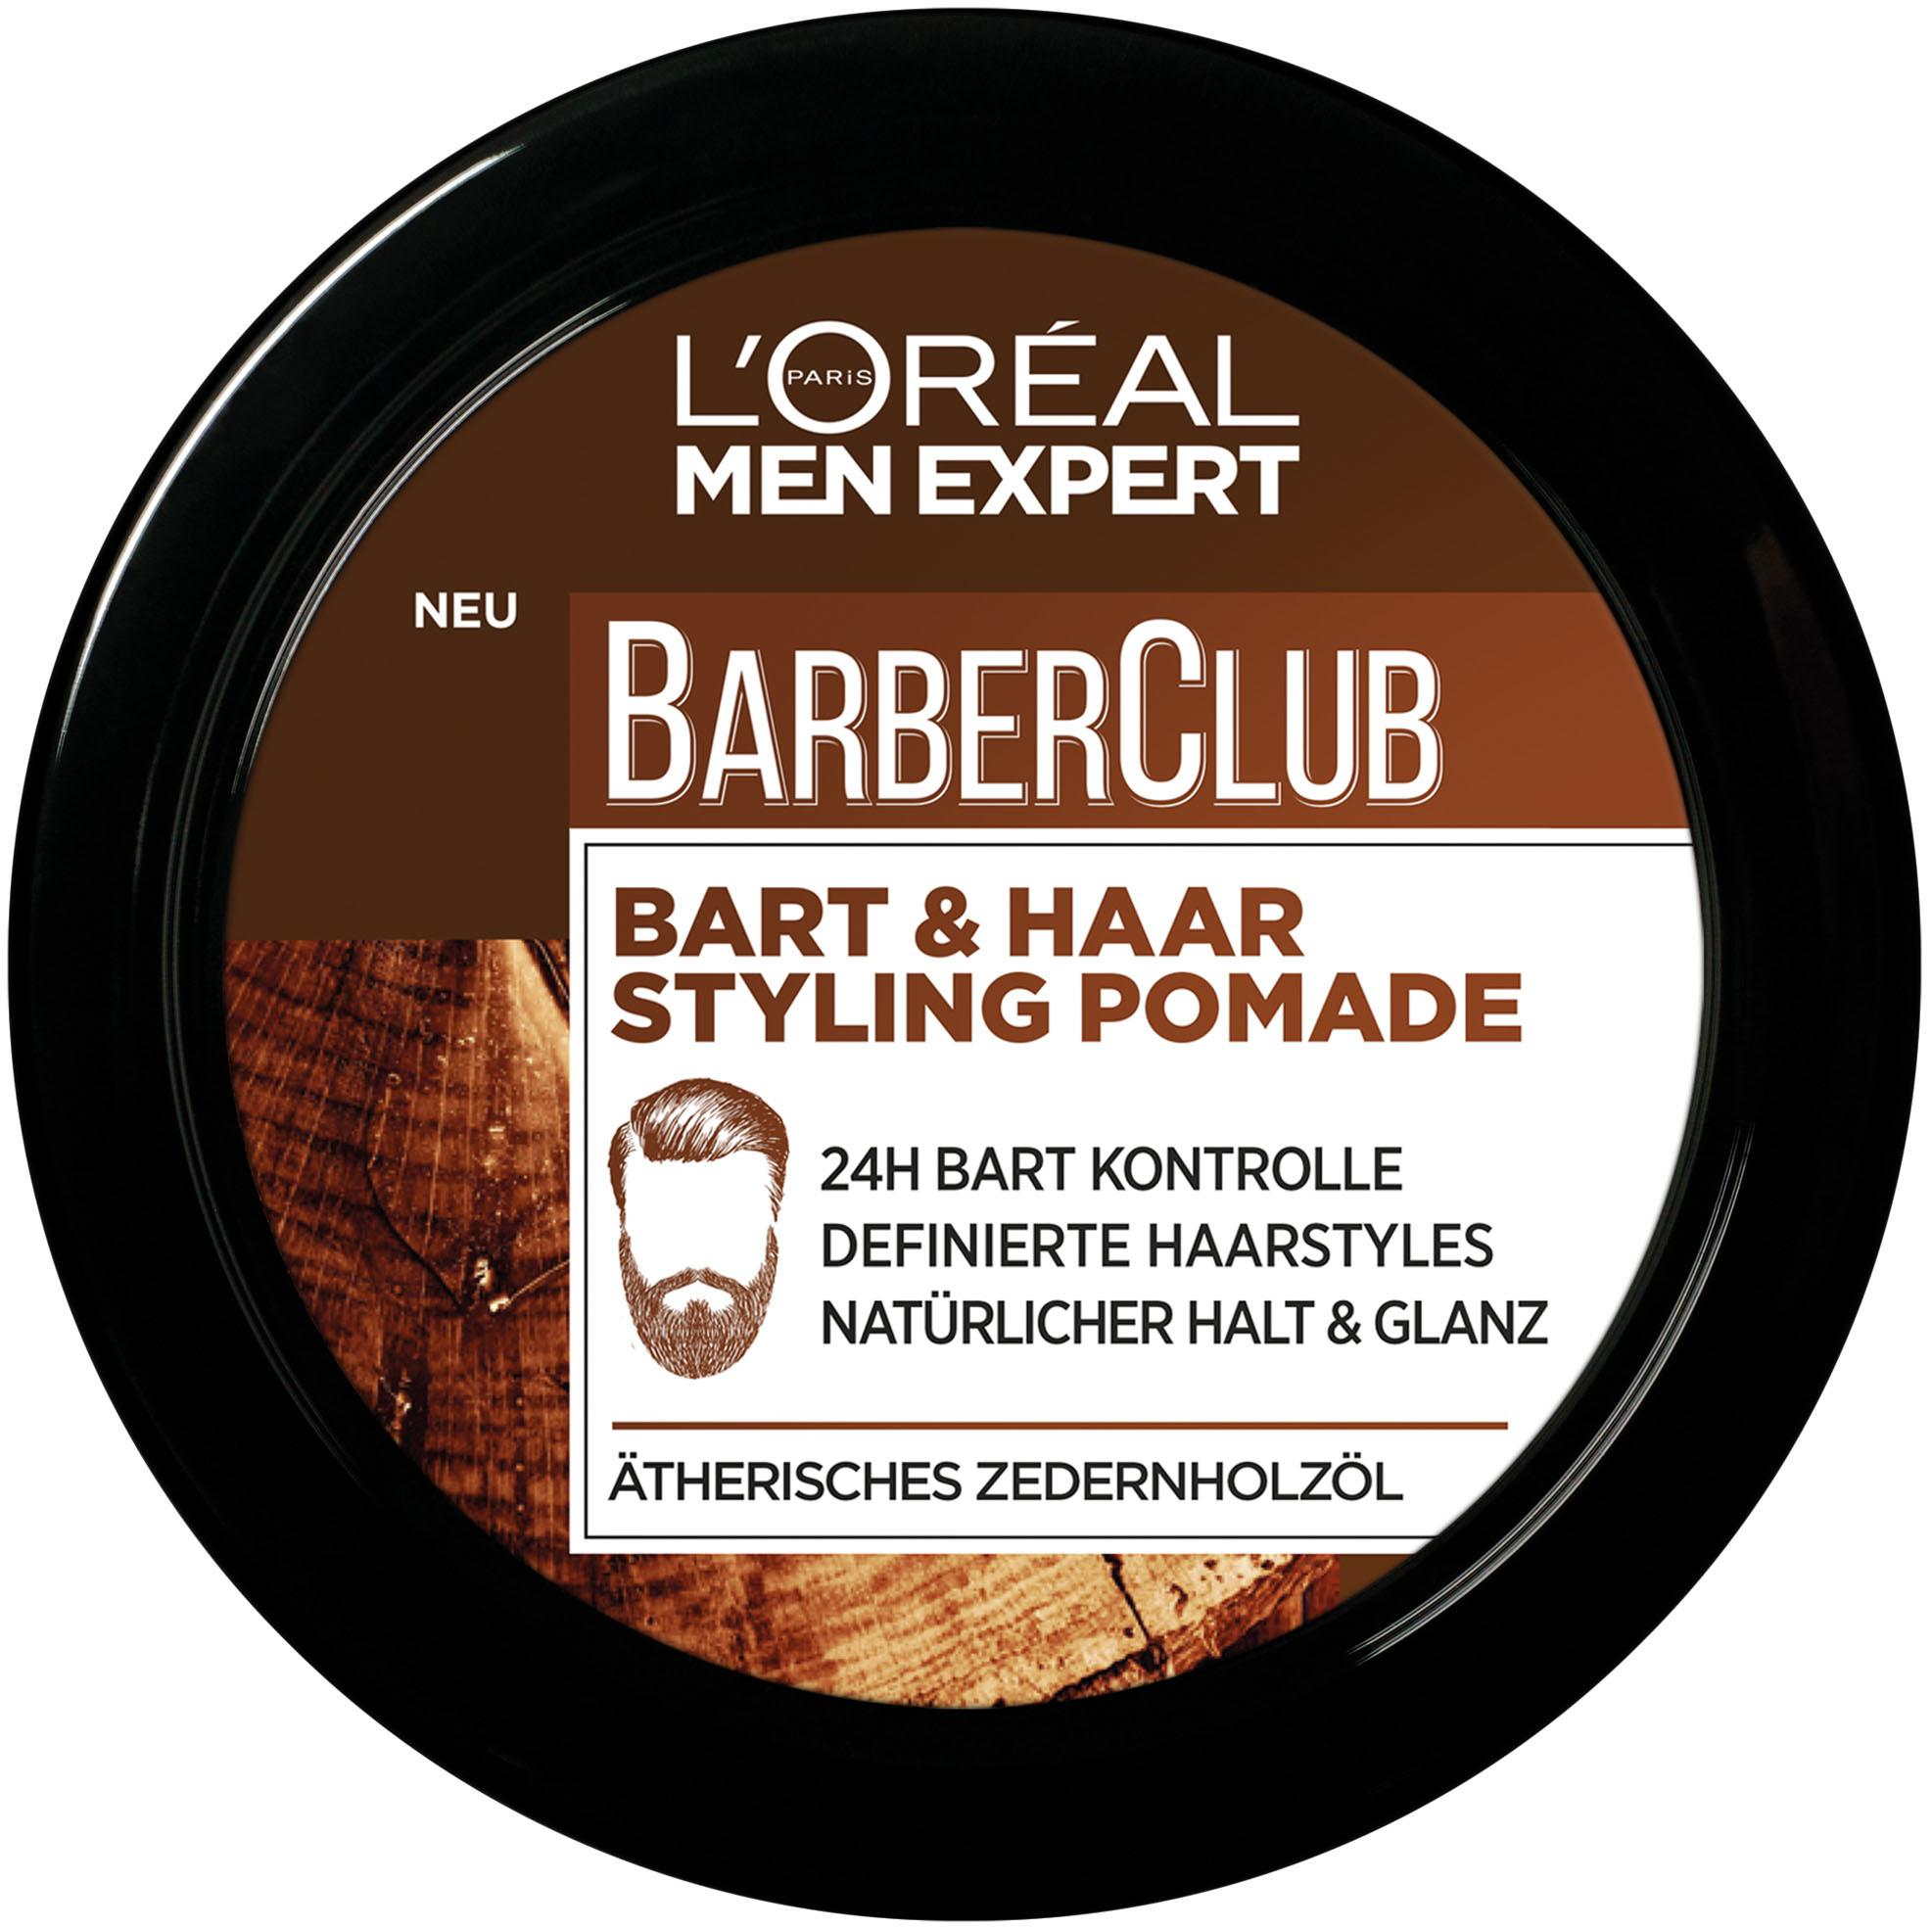 Bartpomade